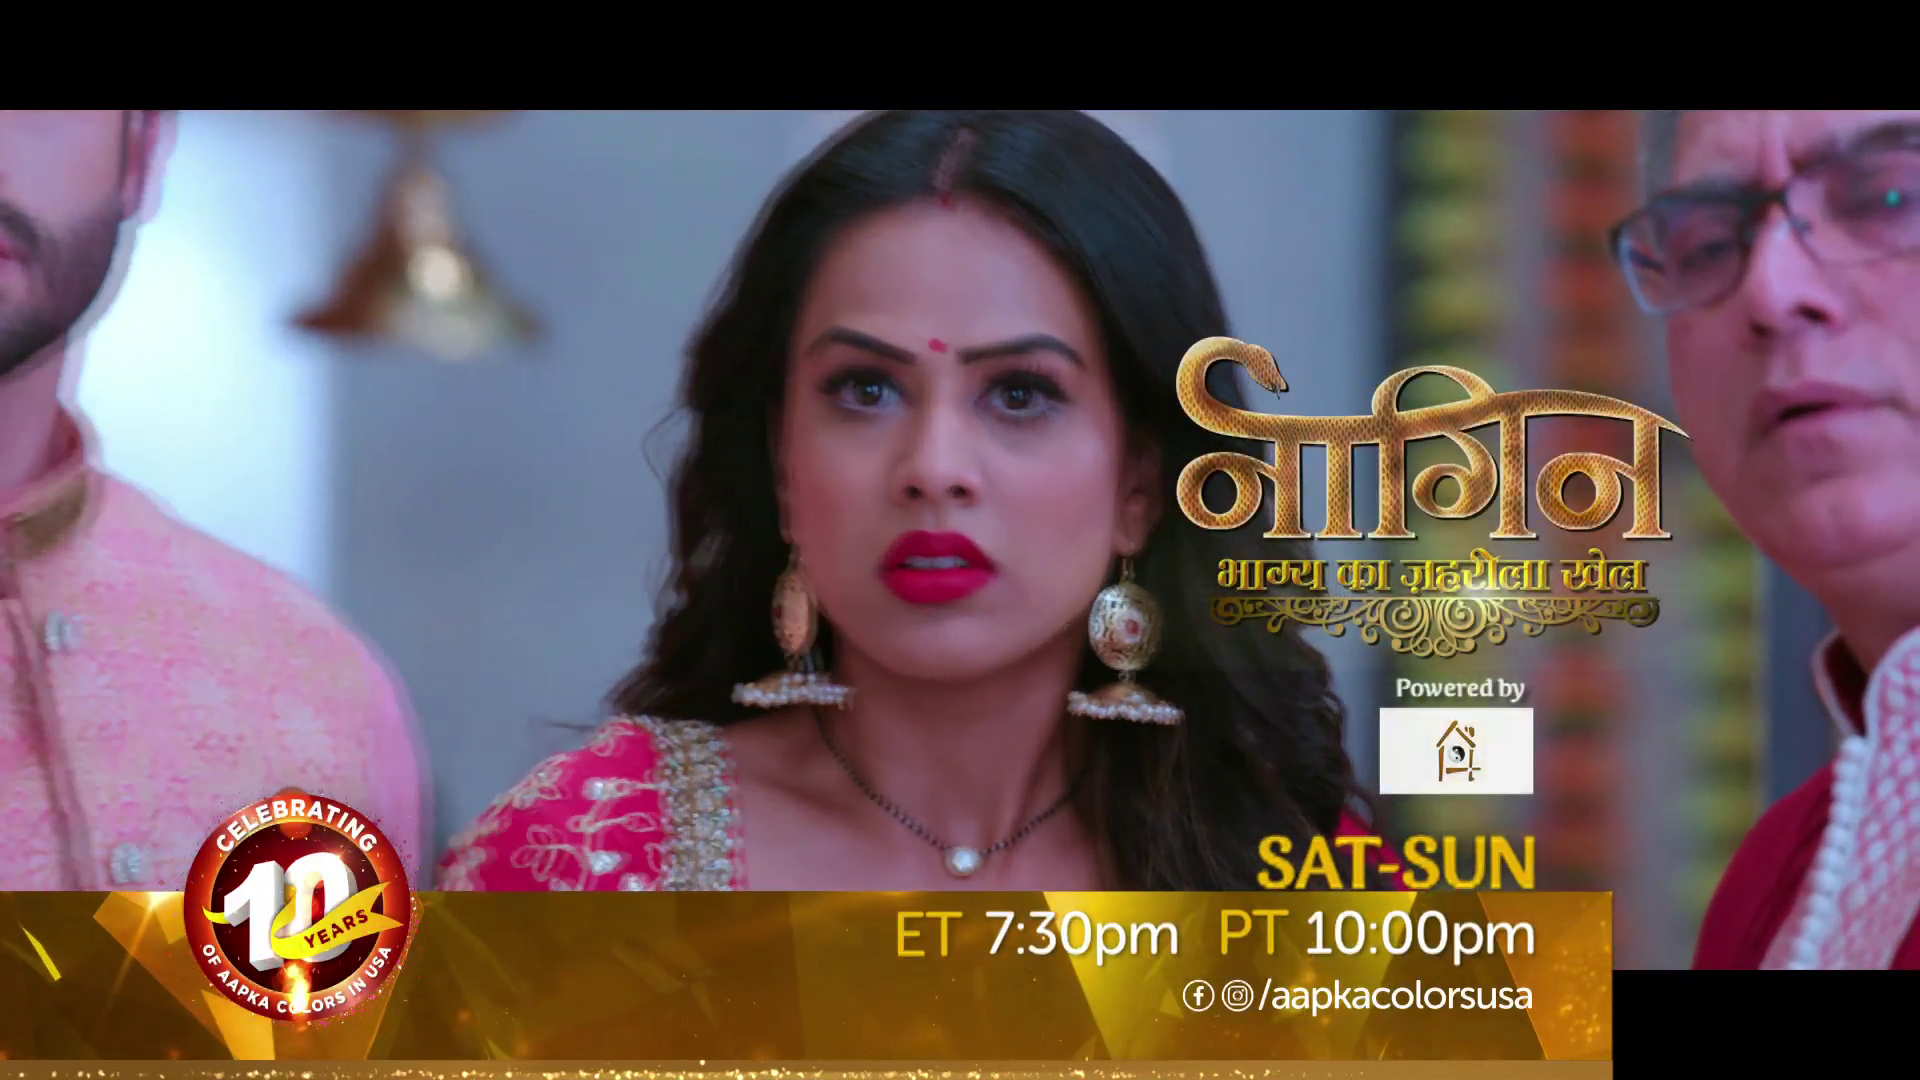 Watch Naagin – bhagya ka zehrila khel Sat-Sun 7:30pm ET/ 10pm PT